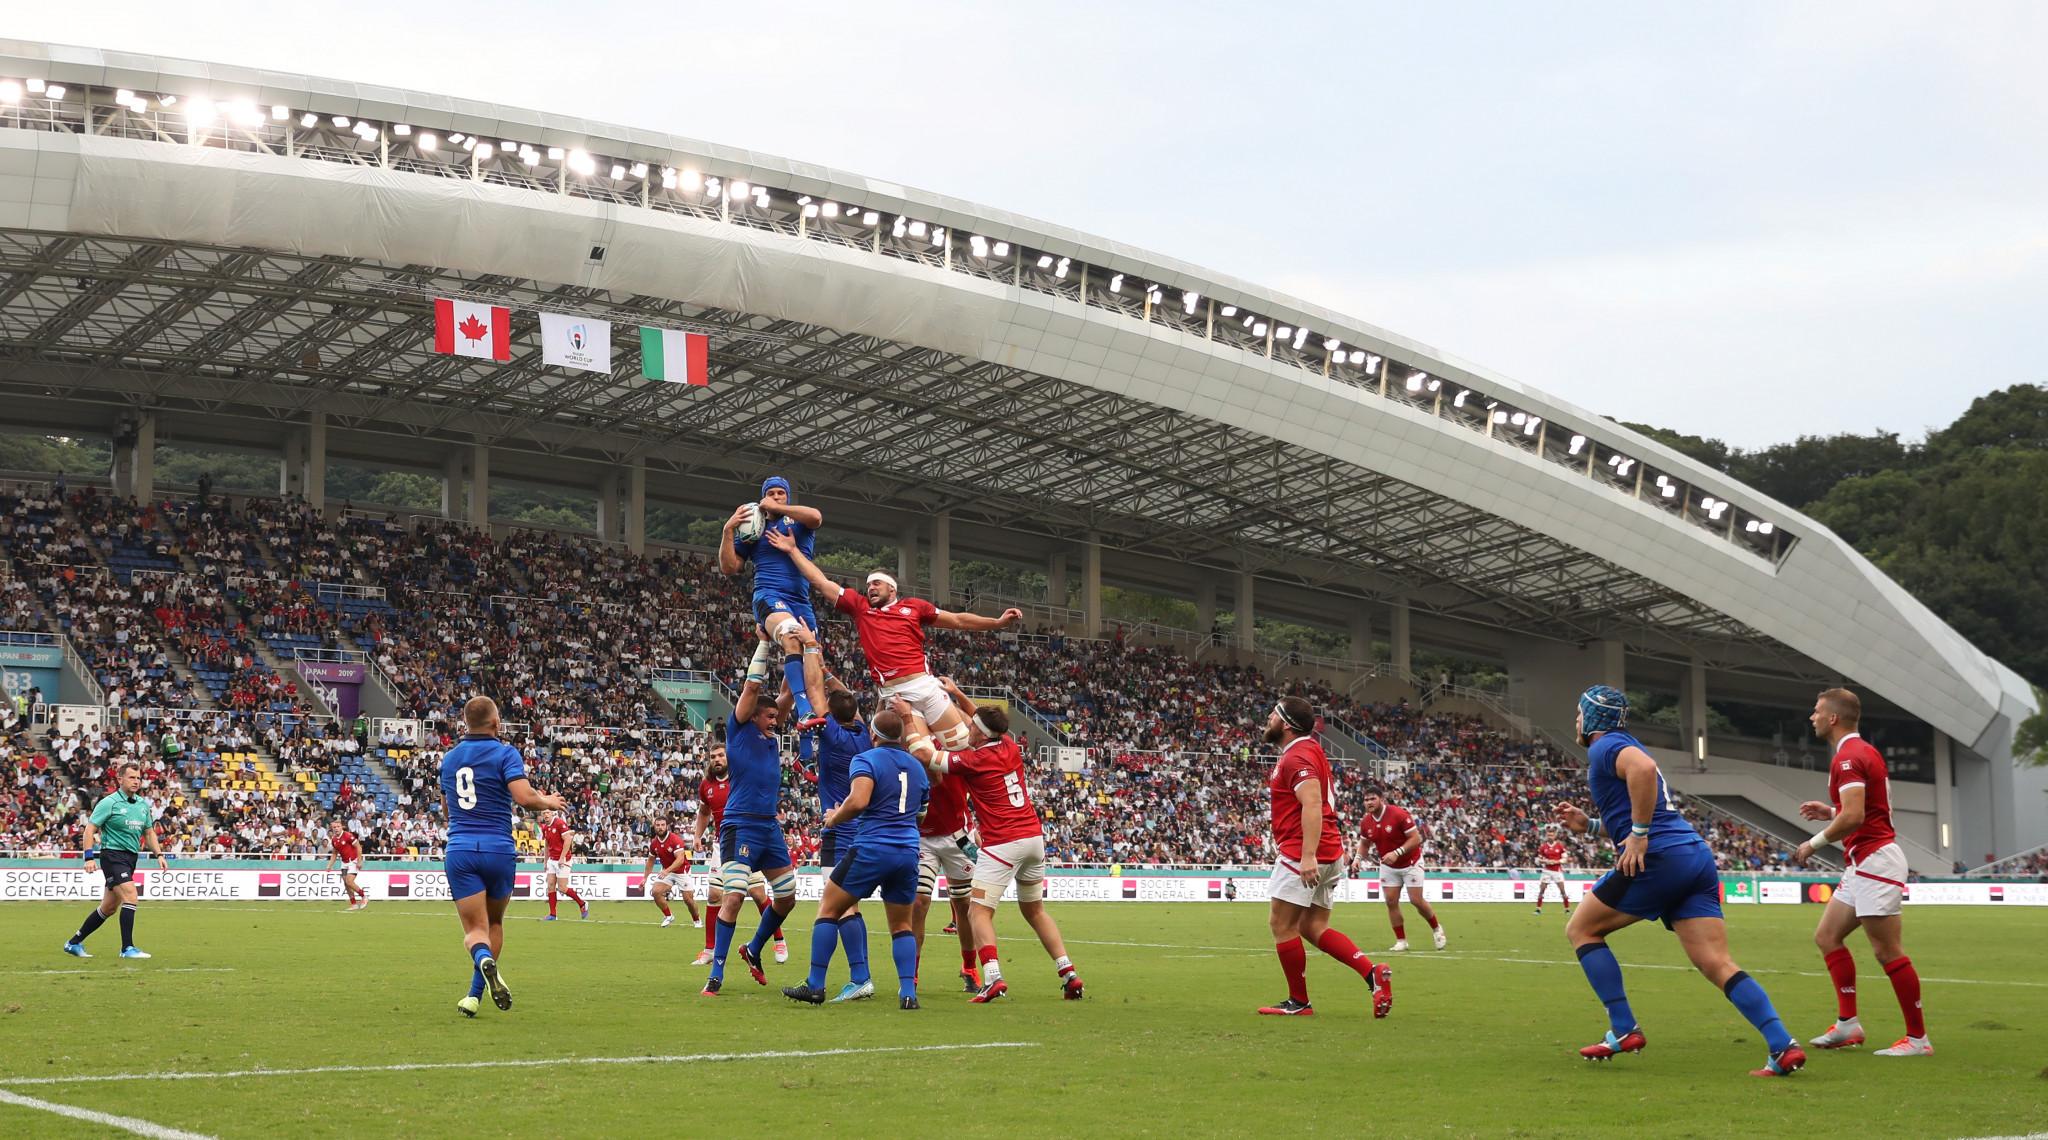 Fukuoka Hakatanomori Stadium is due to host the two sides on Wednesday ©Getty Images